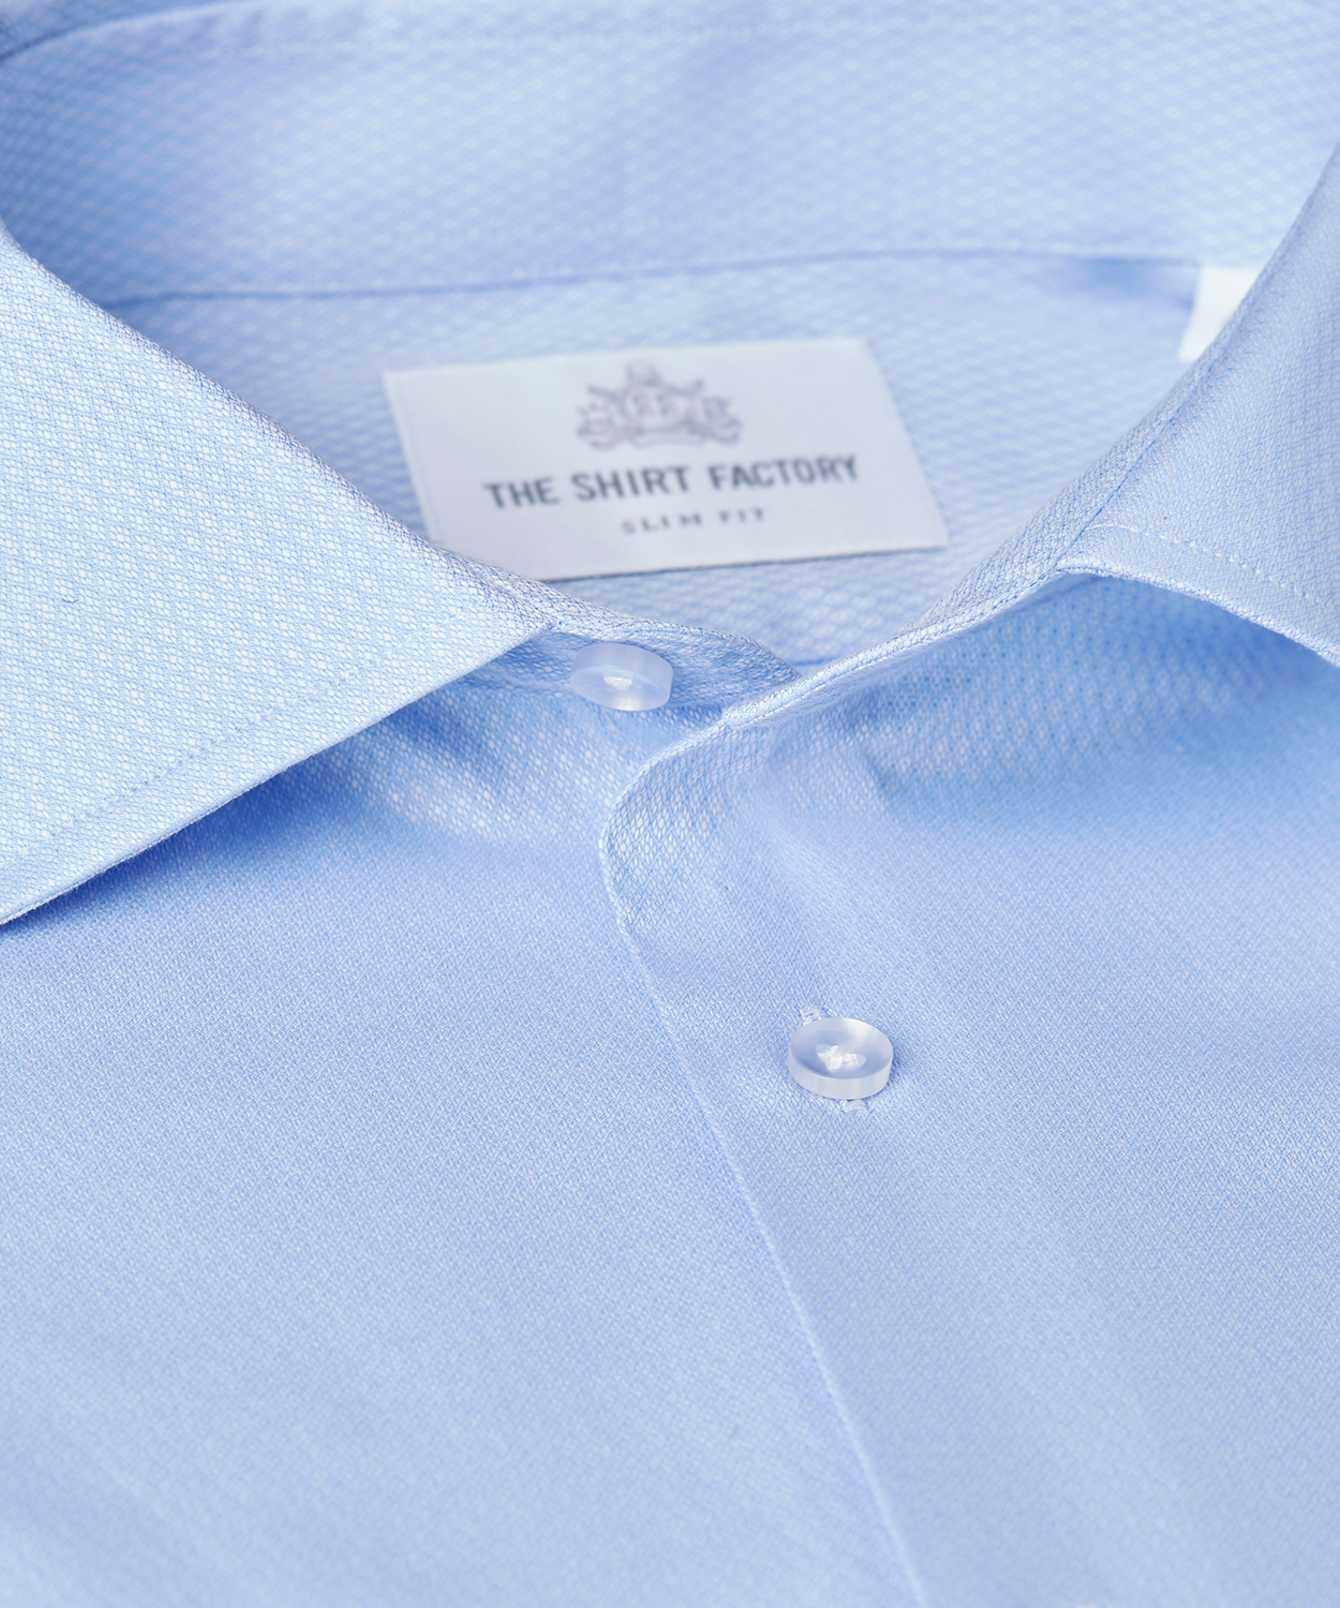 Shirt Wiston The Shirt Factory